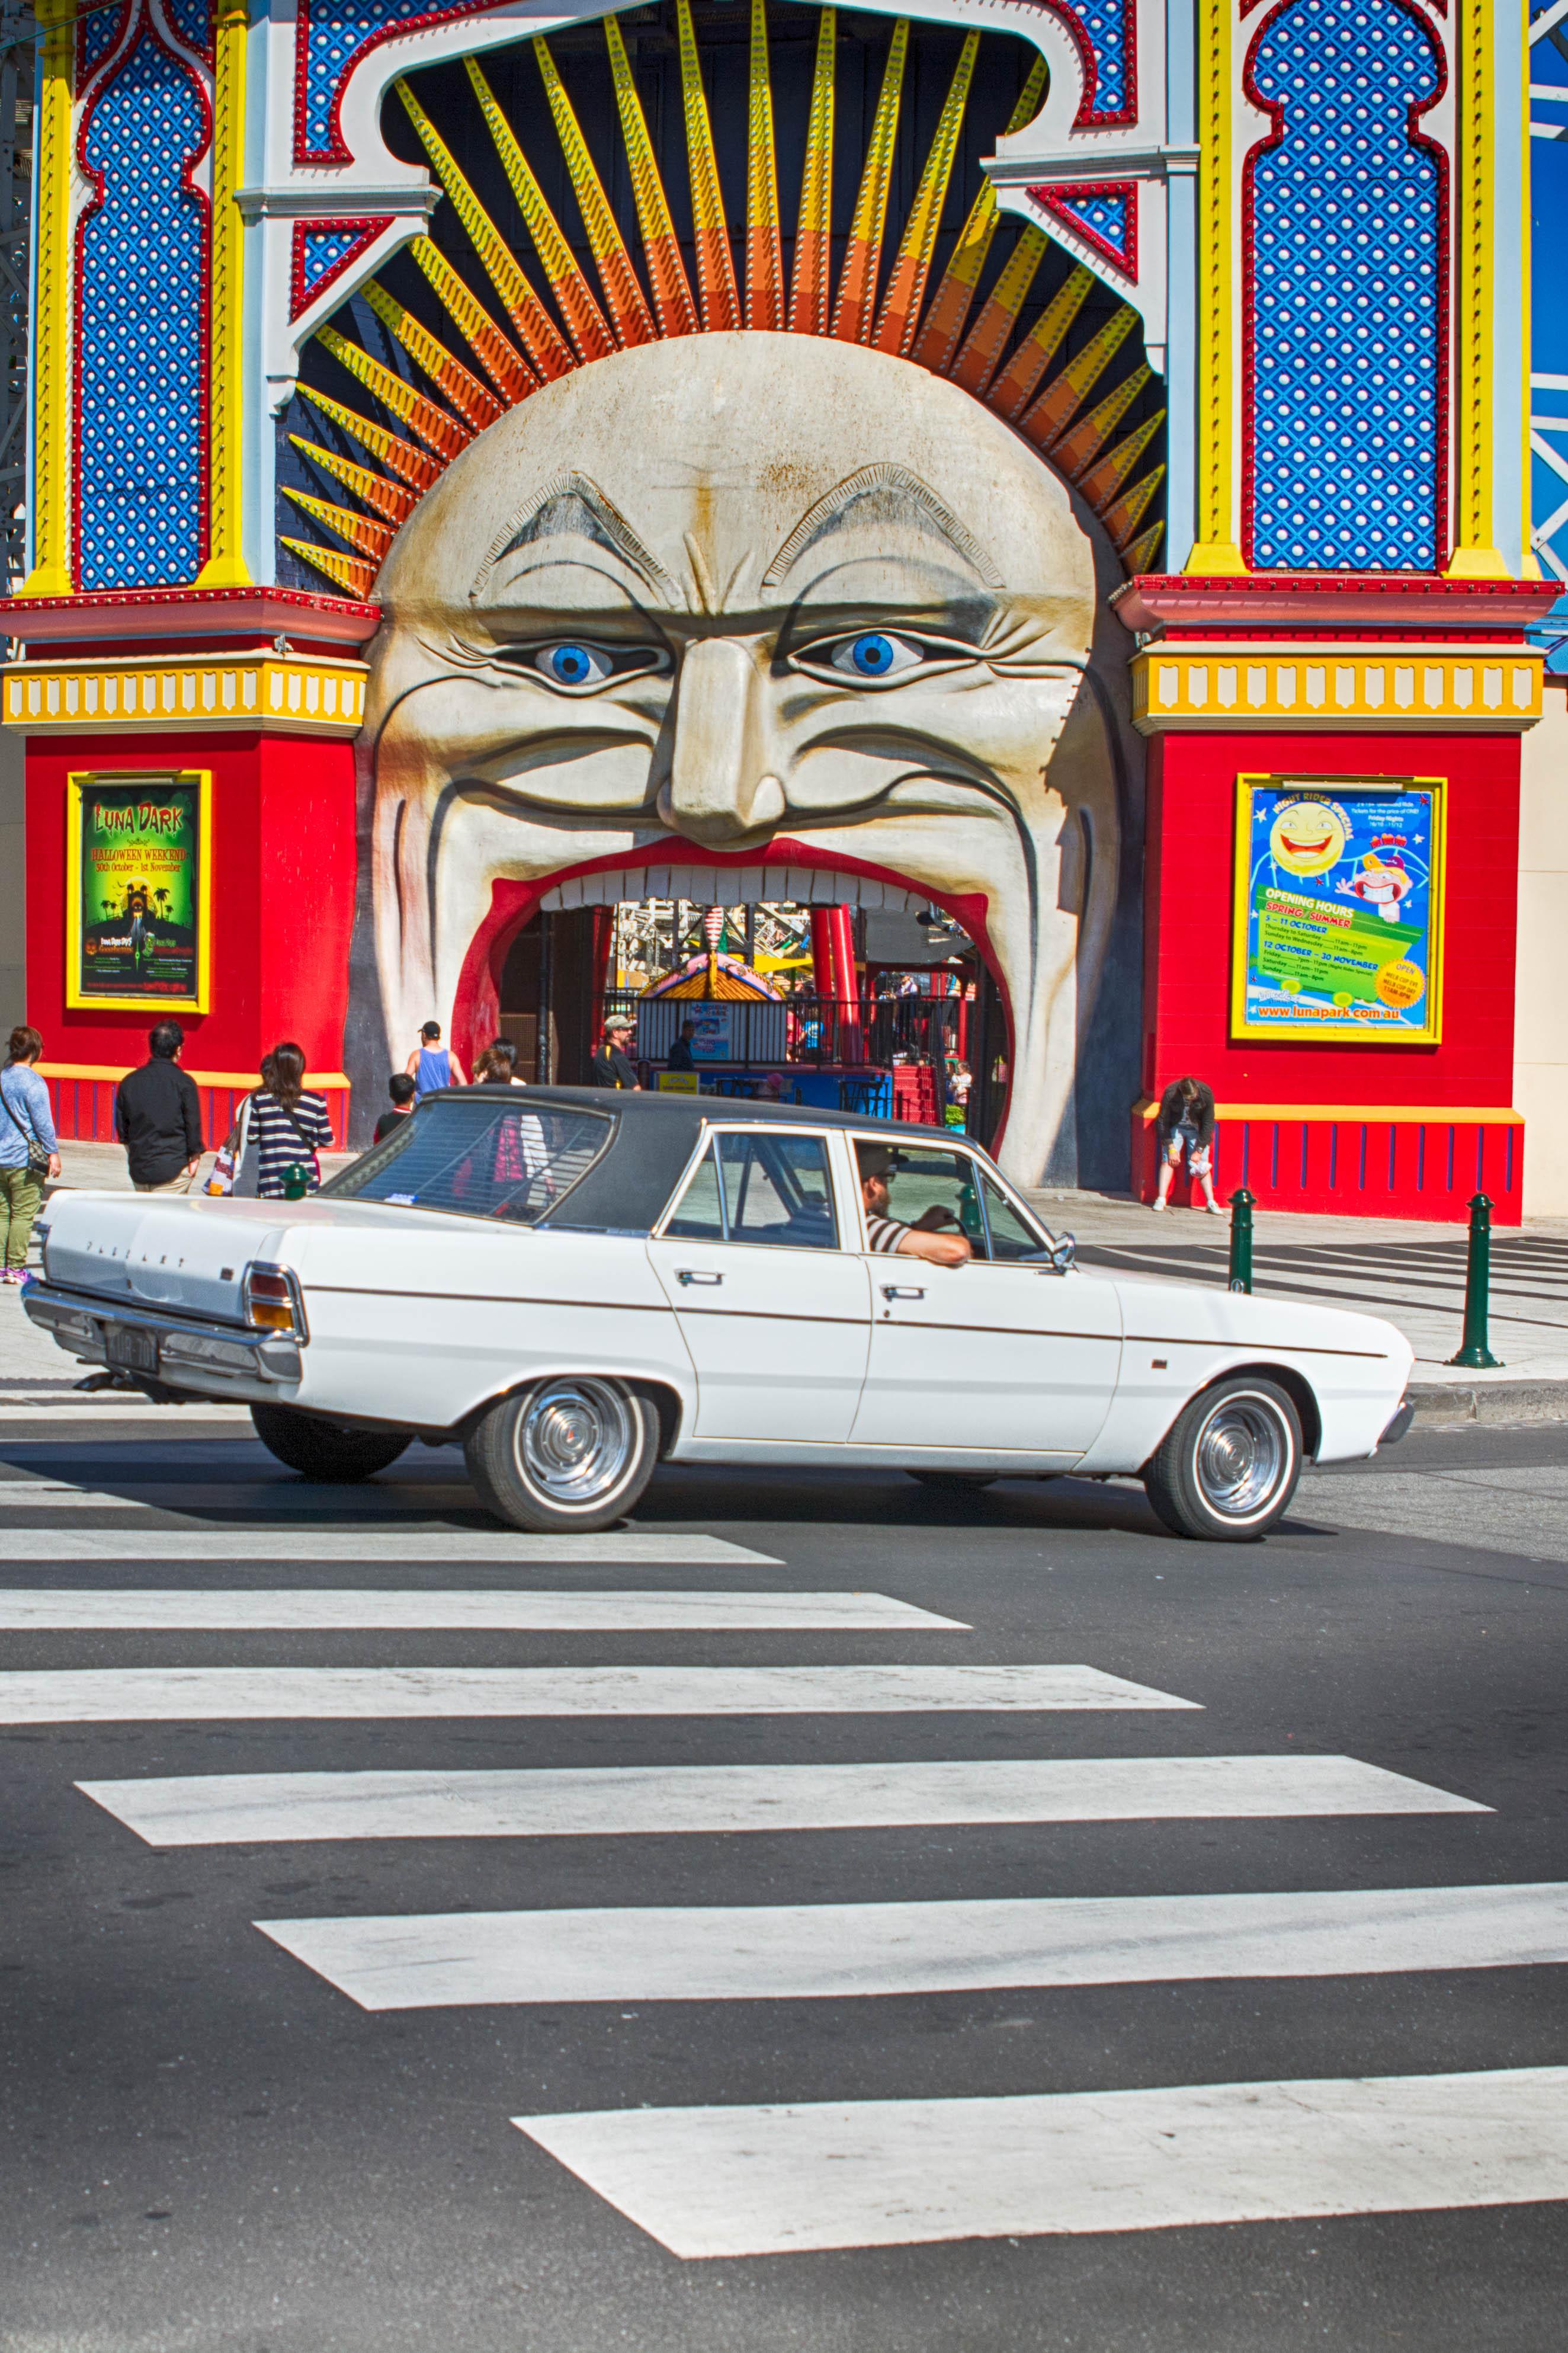 Free Images : road, street, advertising, vehicle, vintage car ...